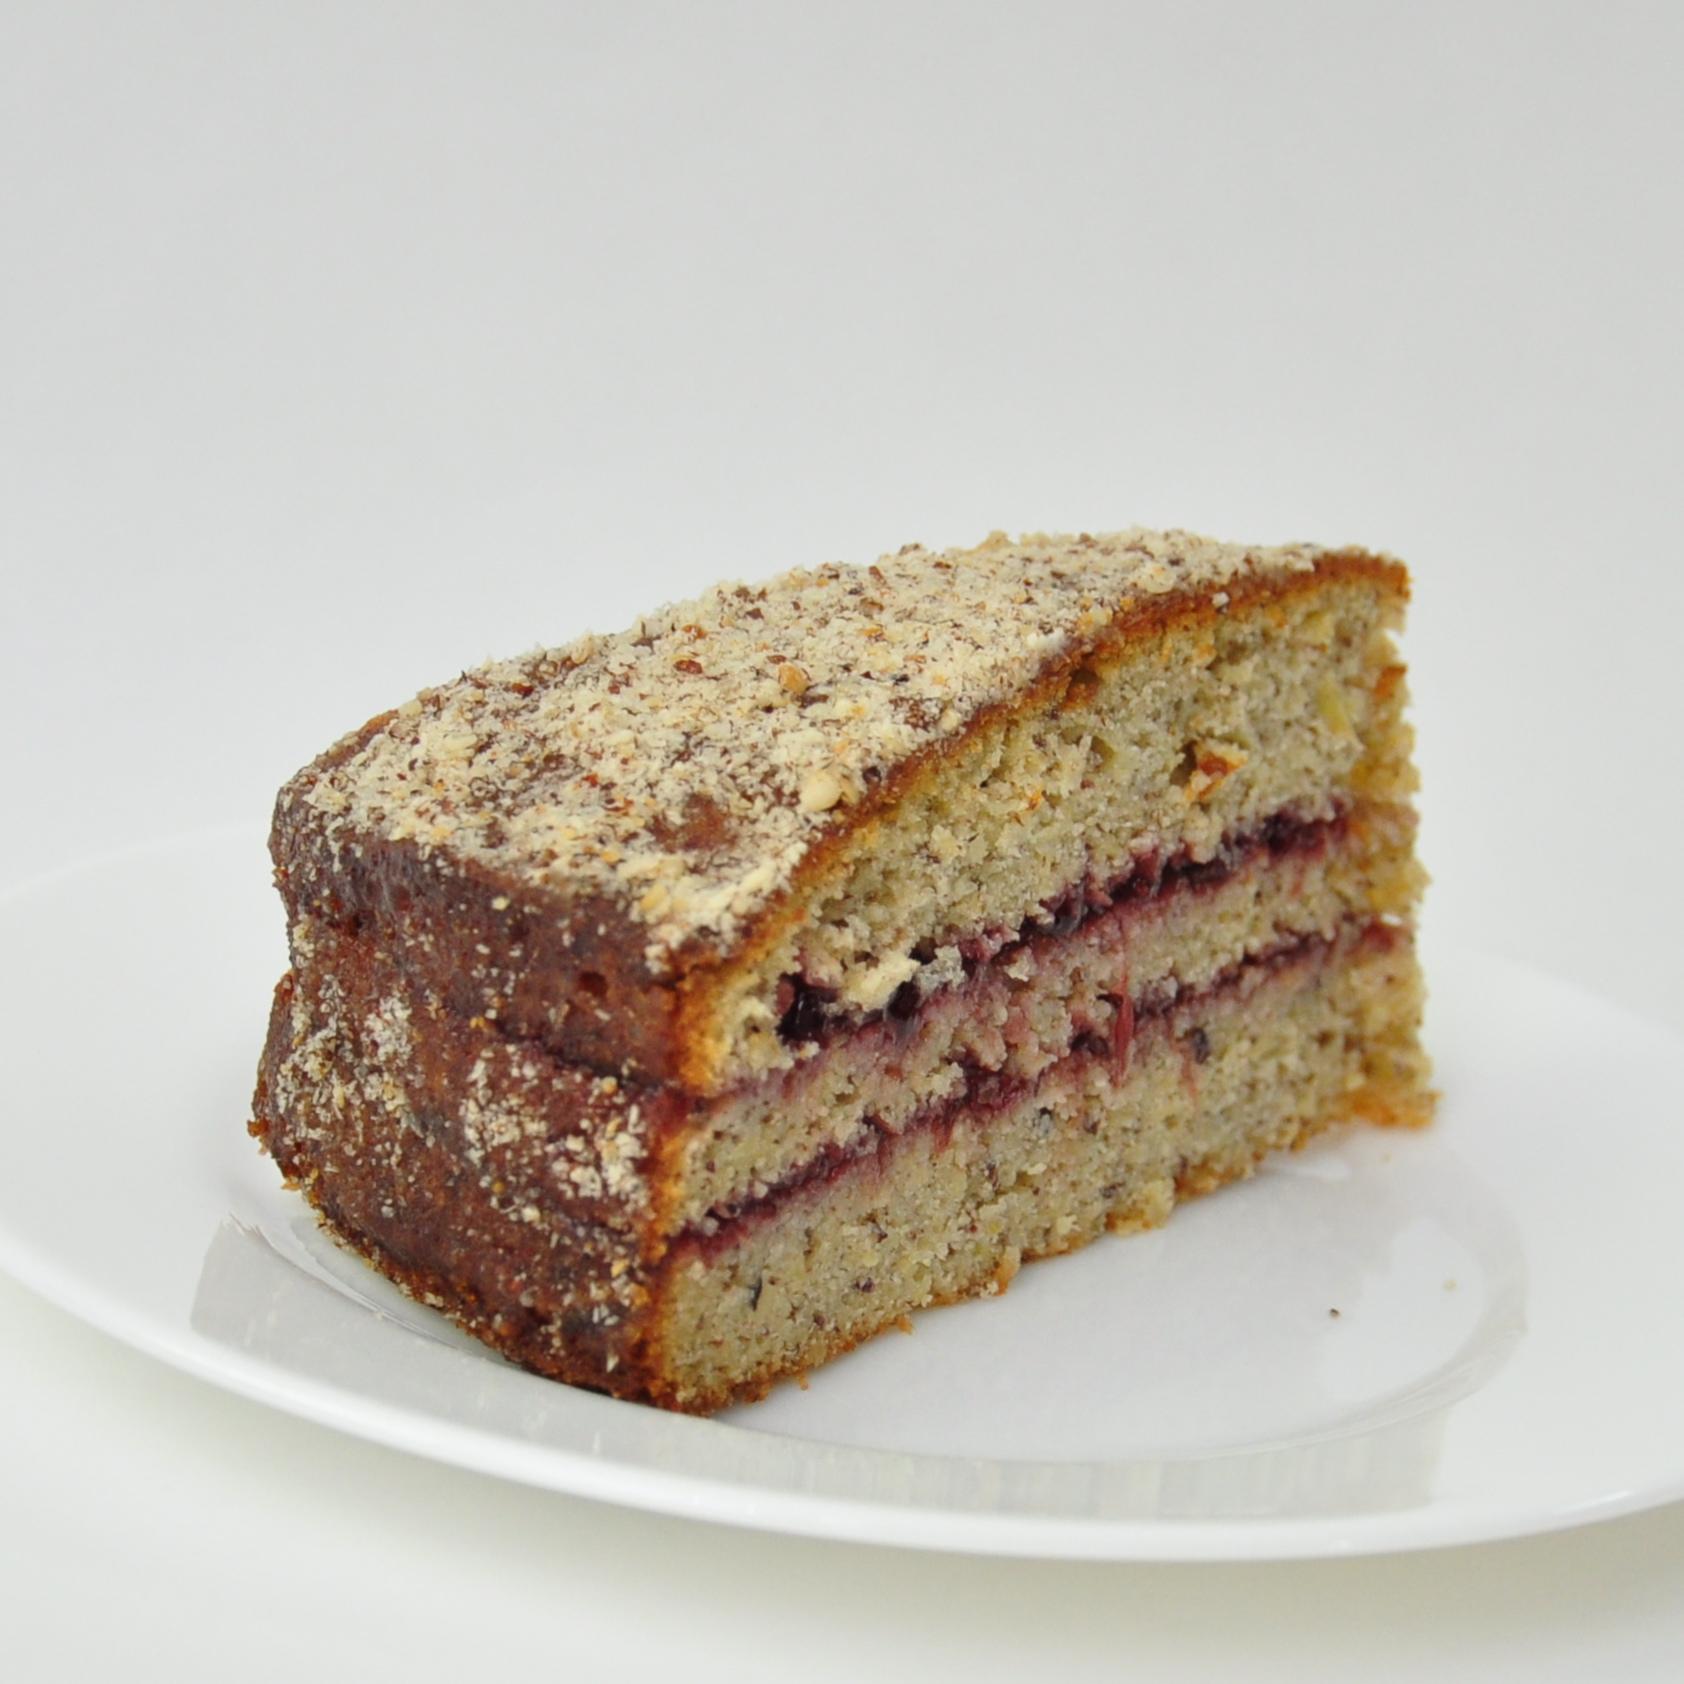 Eis-Voh-glutenfrei-Kuchen-Tiroler-Nusstorte